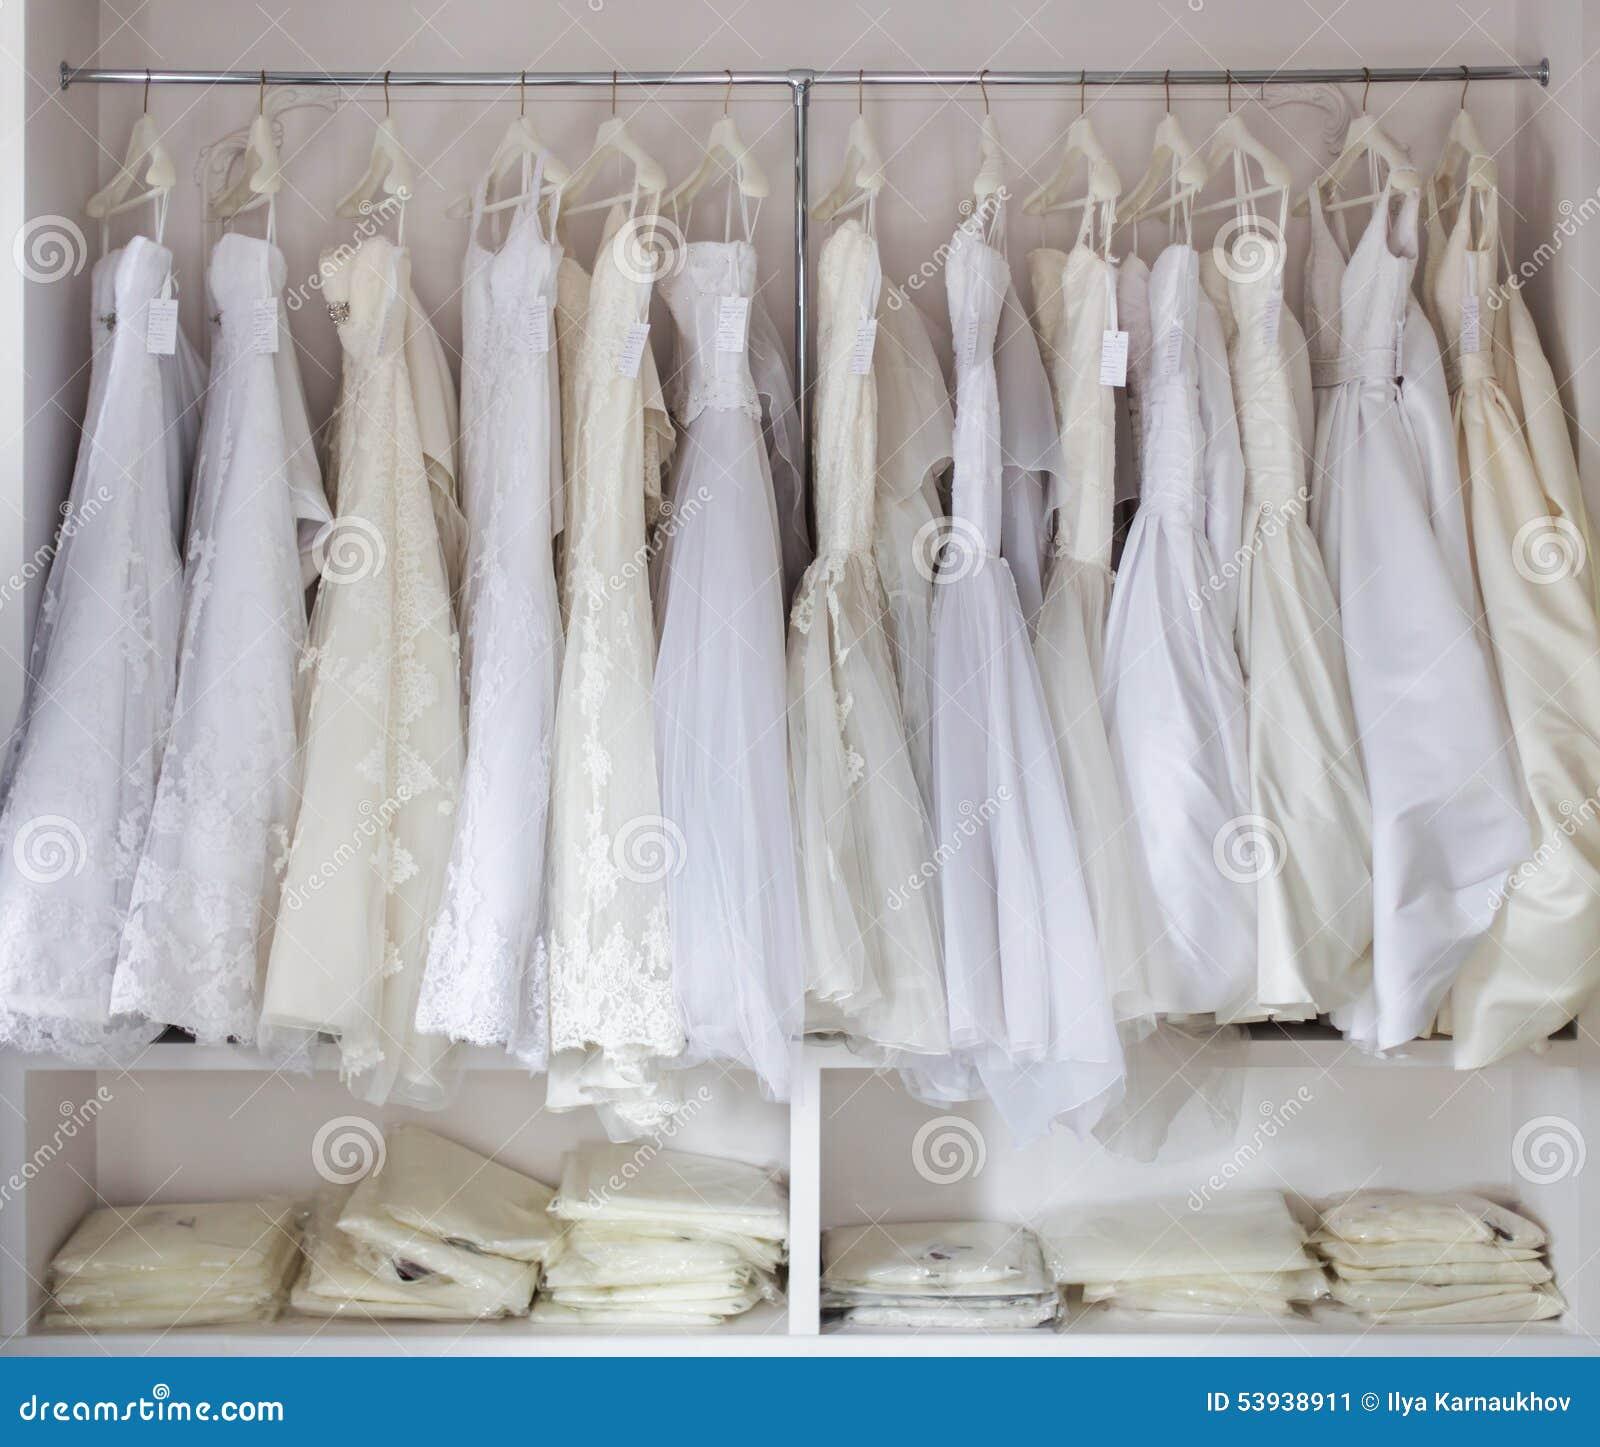 White Wedding Dress Hanger: Bridal Store Stock Photo